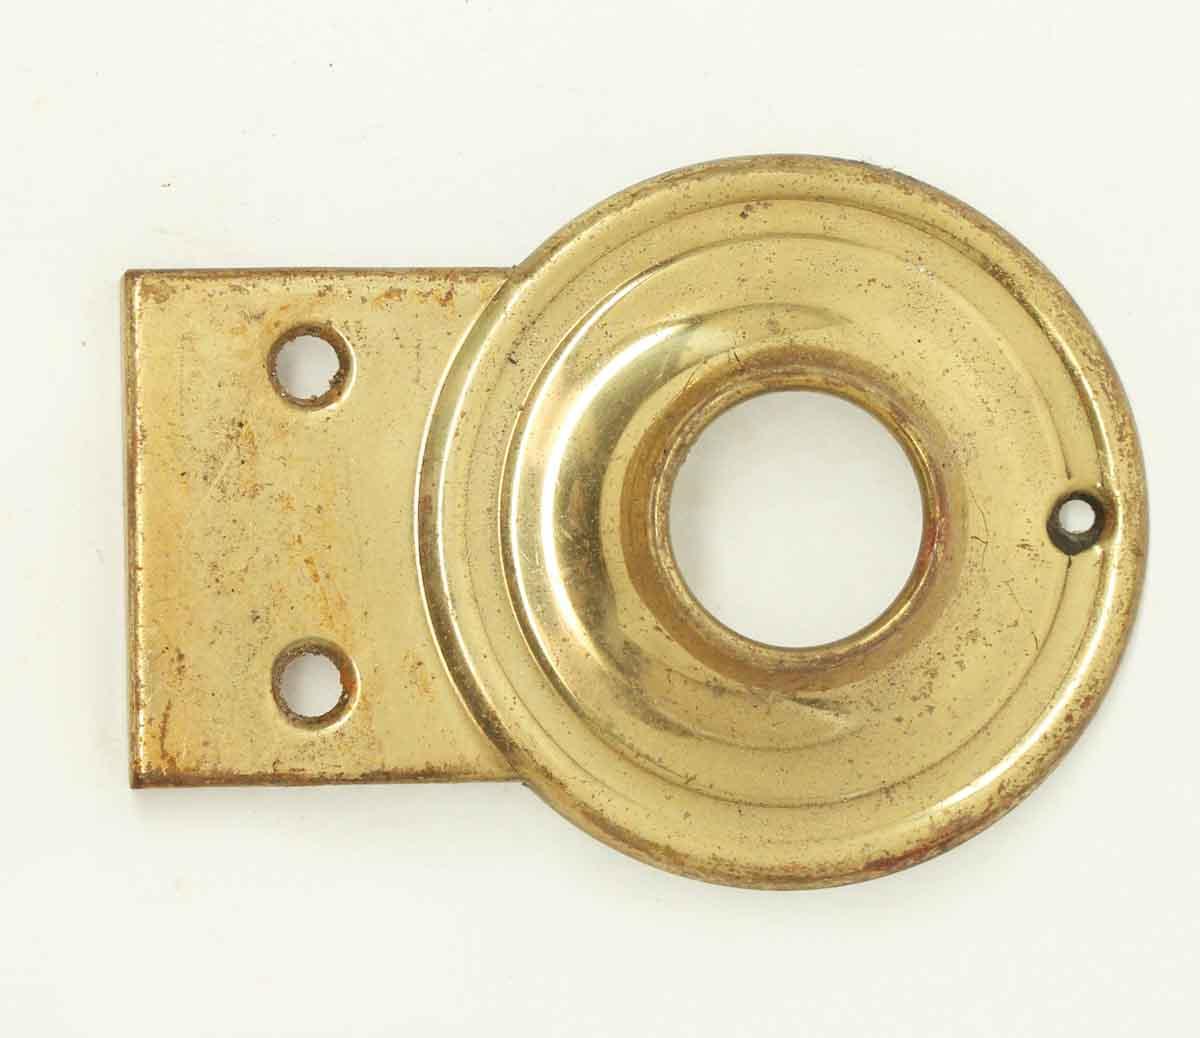 Bronze door bell or peephole cover olde good things - Door knocker with peep hole ...